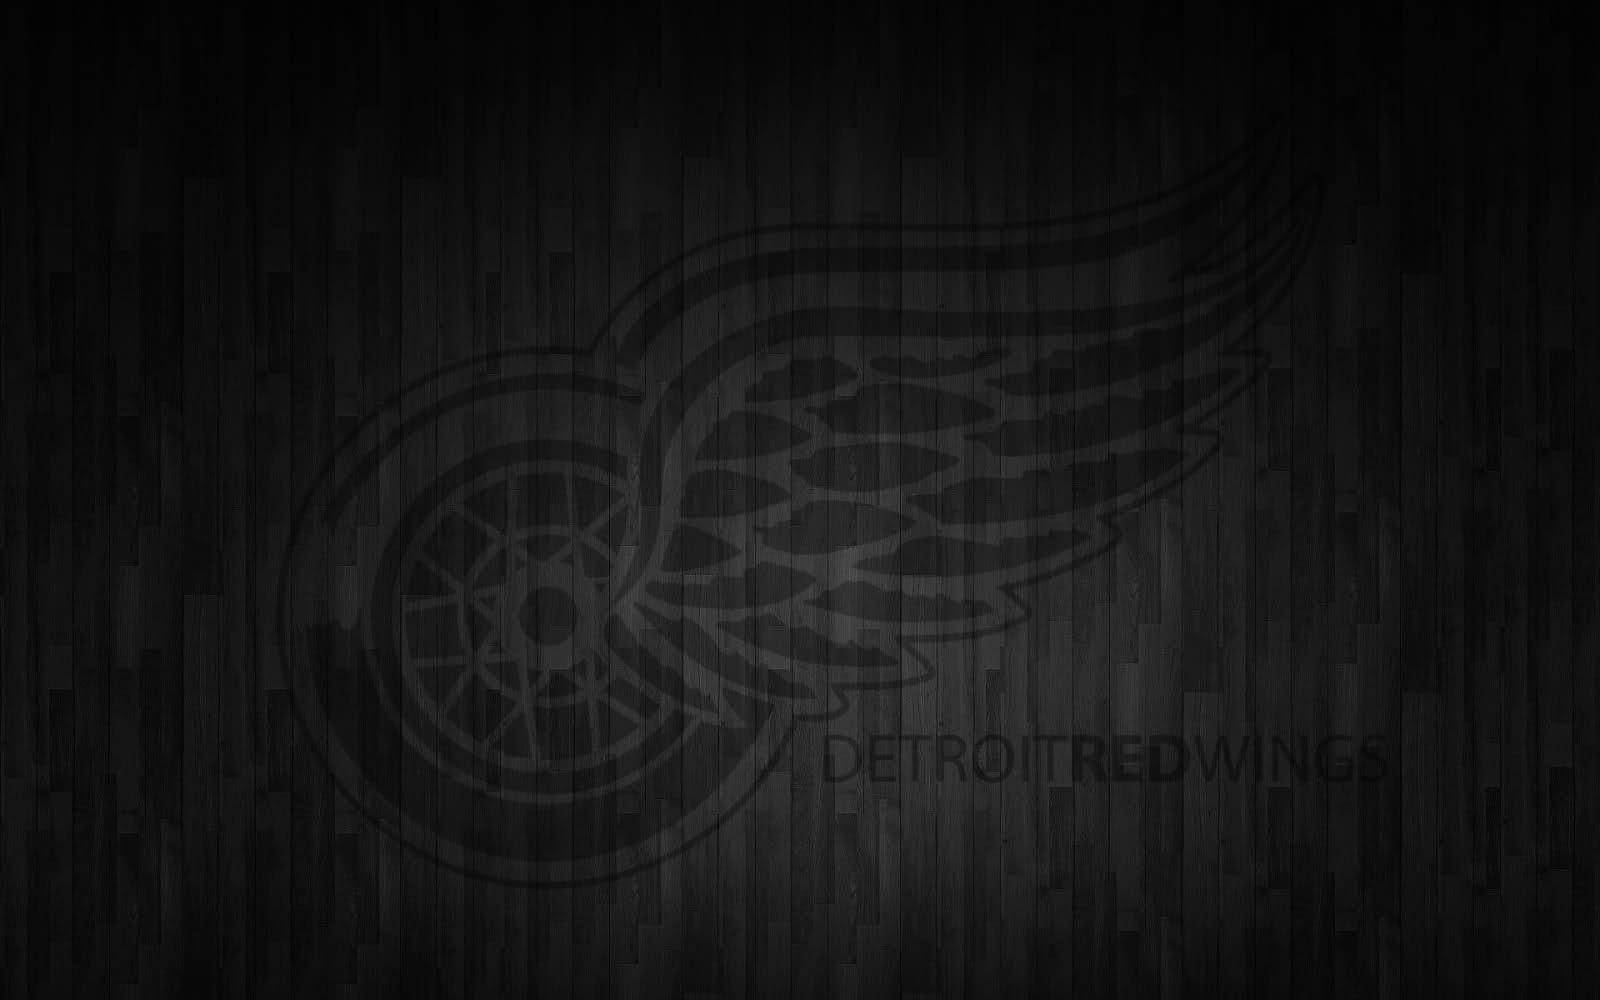 Red Wings Wallpaper HD Wallpapers Plus 1600x1000